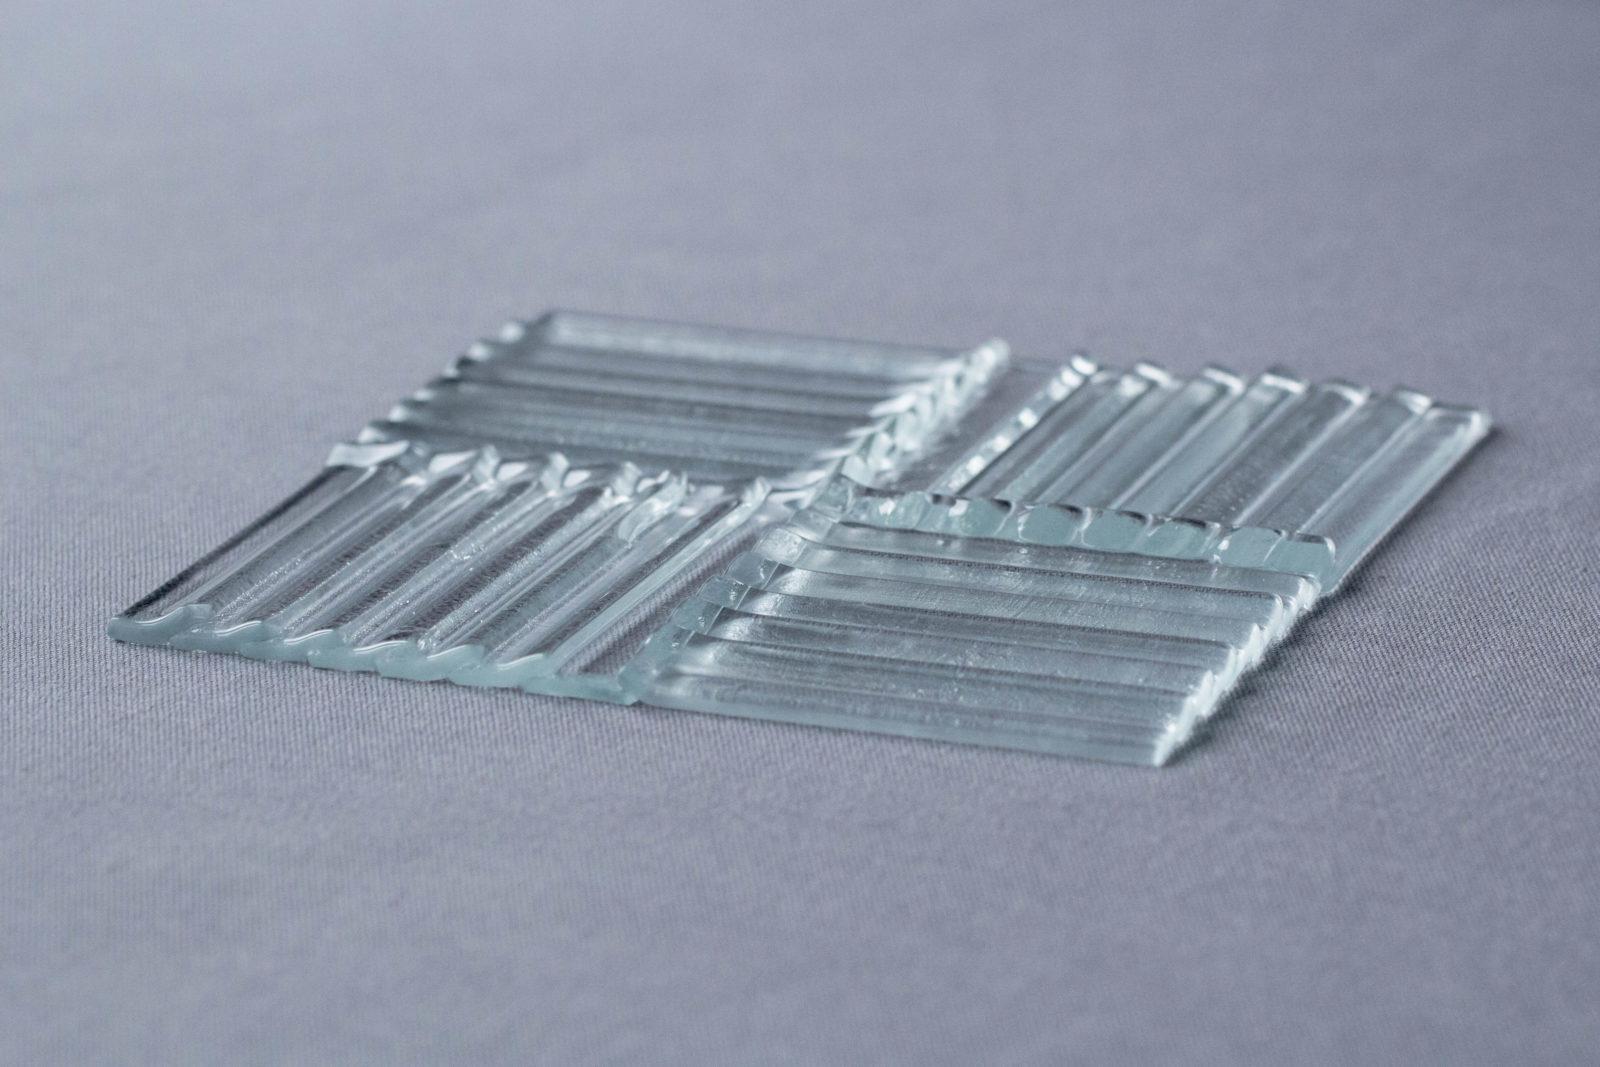 Echantillon verre fragment ondulée thermocollage